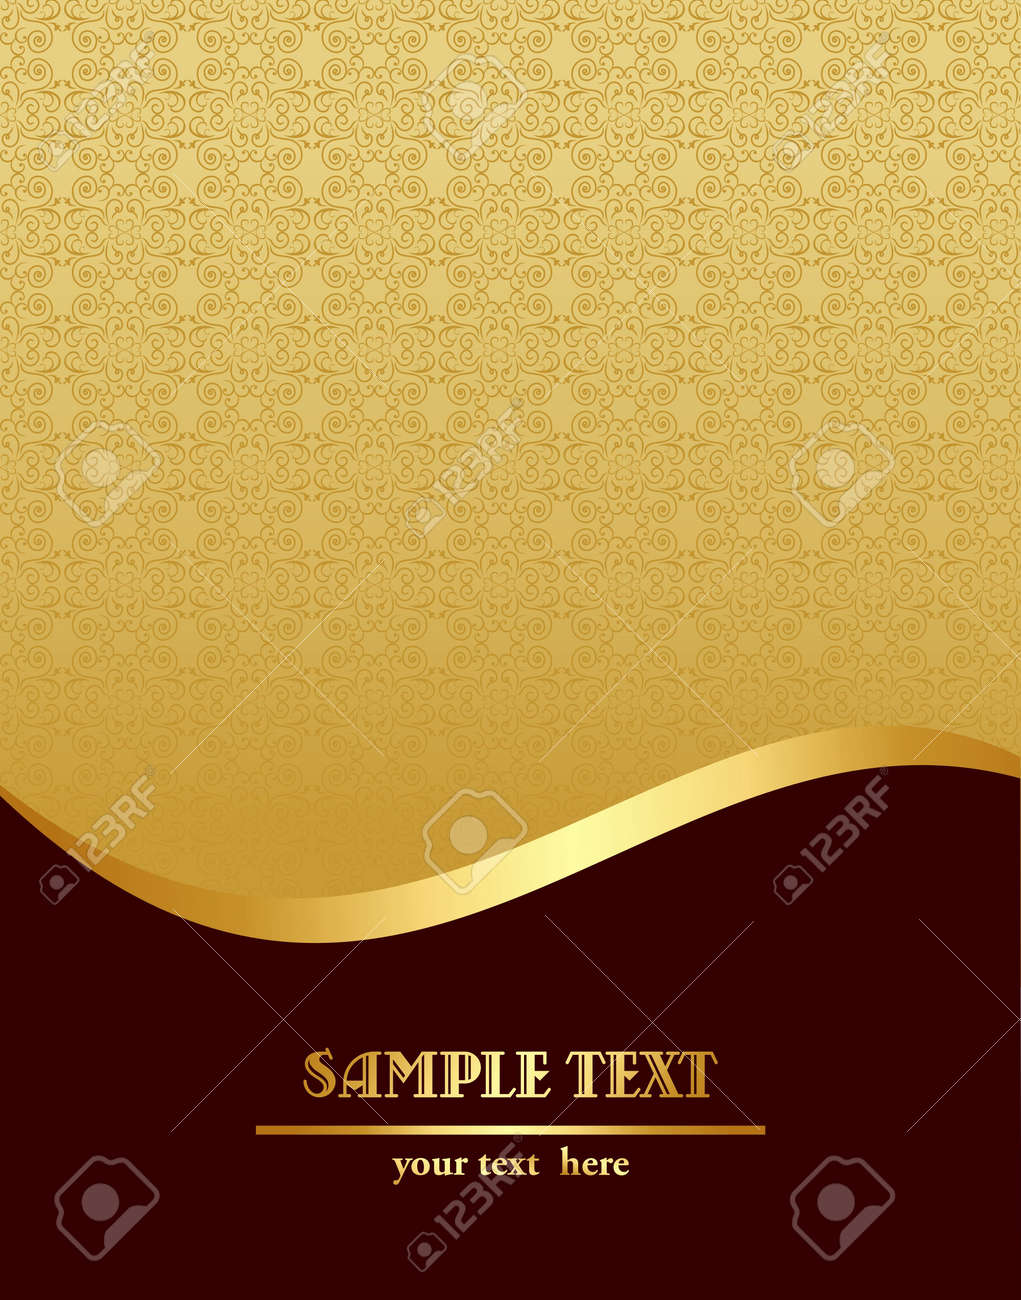 illustration of gold royal vintage template royalty cliparts vector illustration of gold royal vintage template